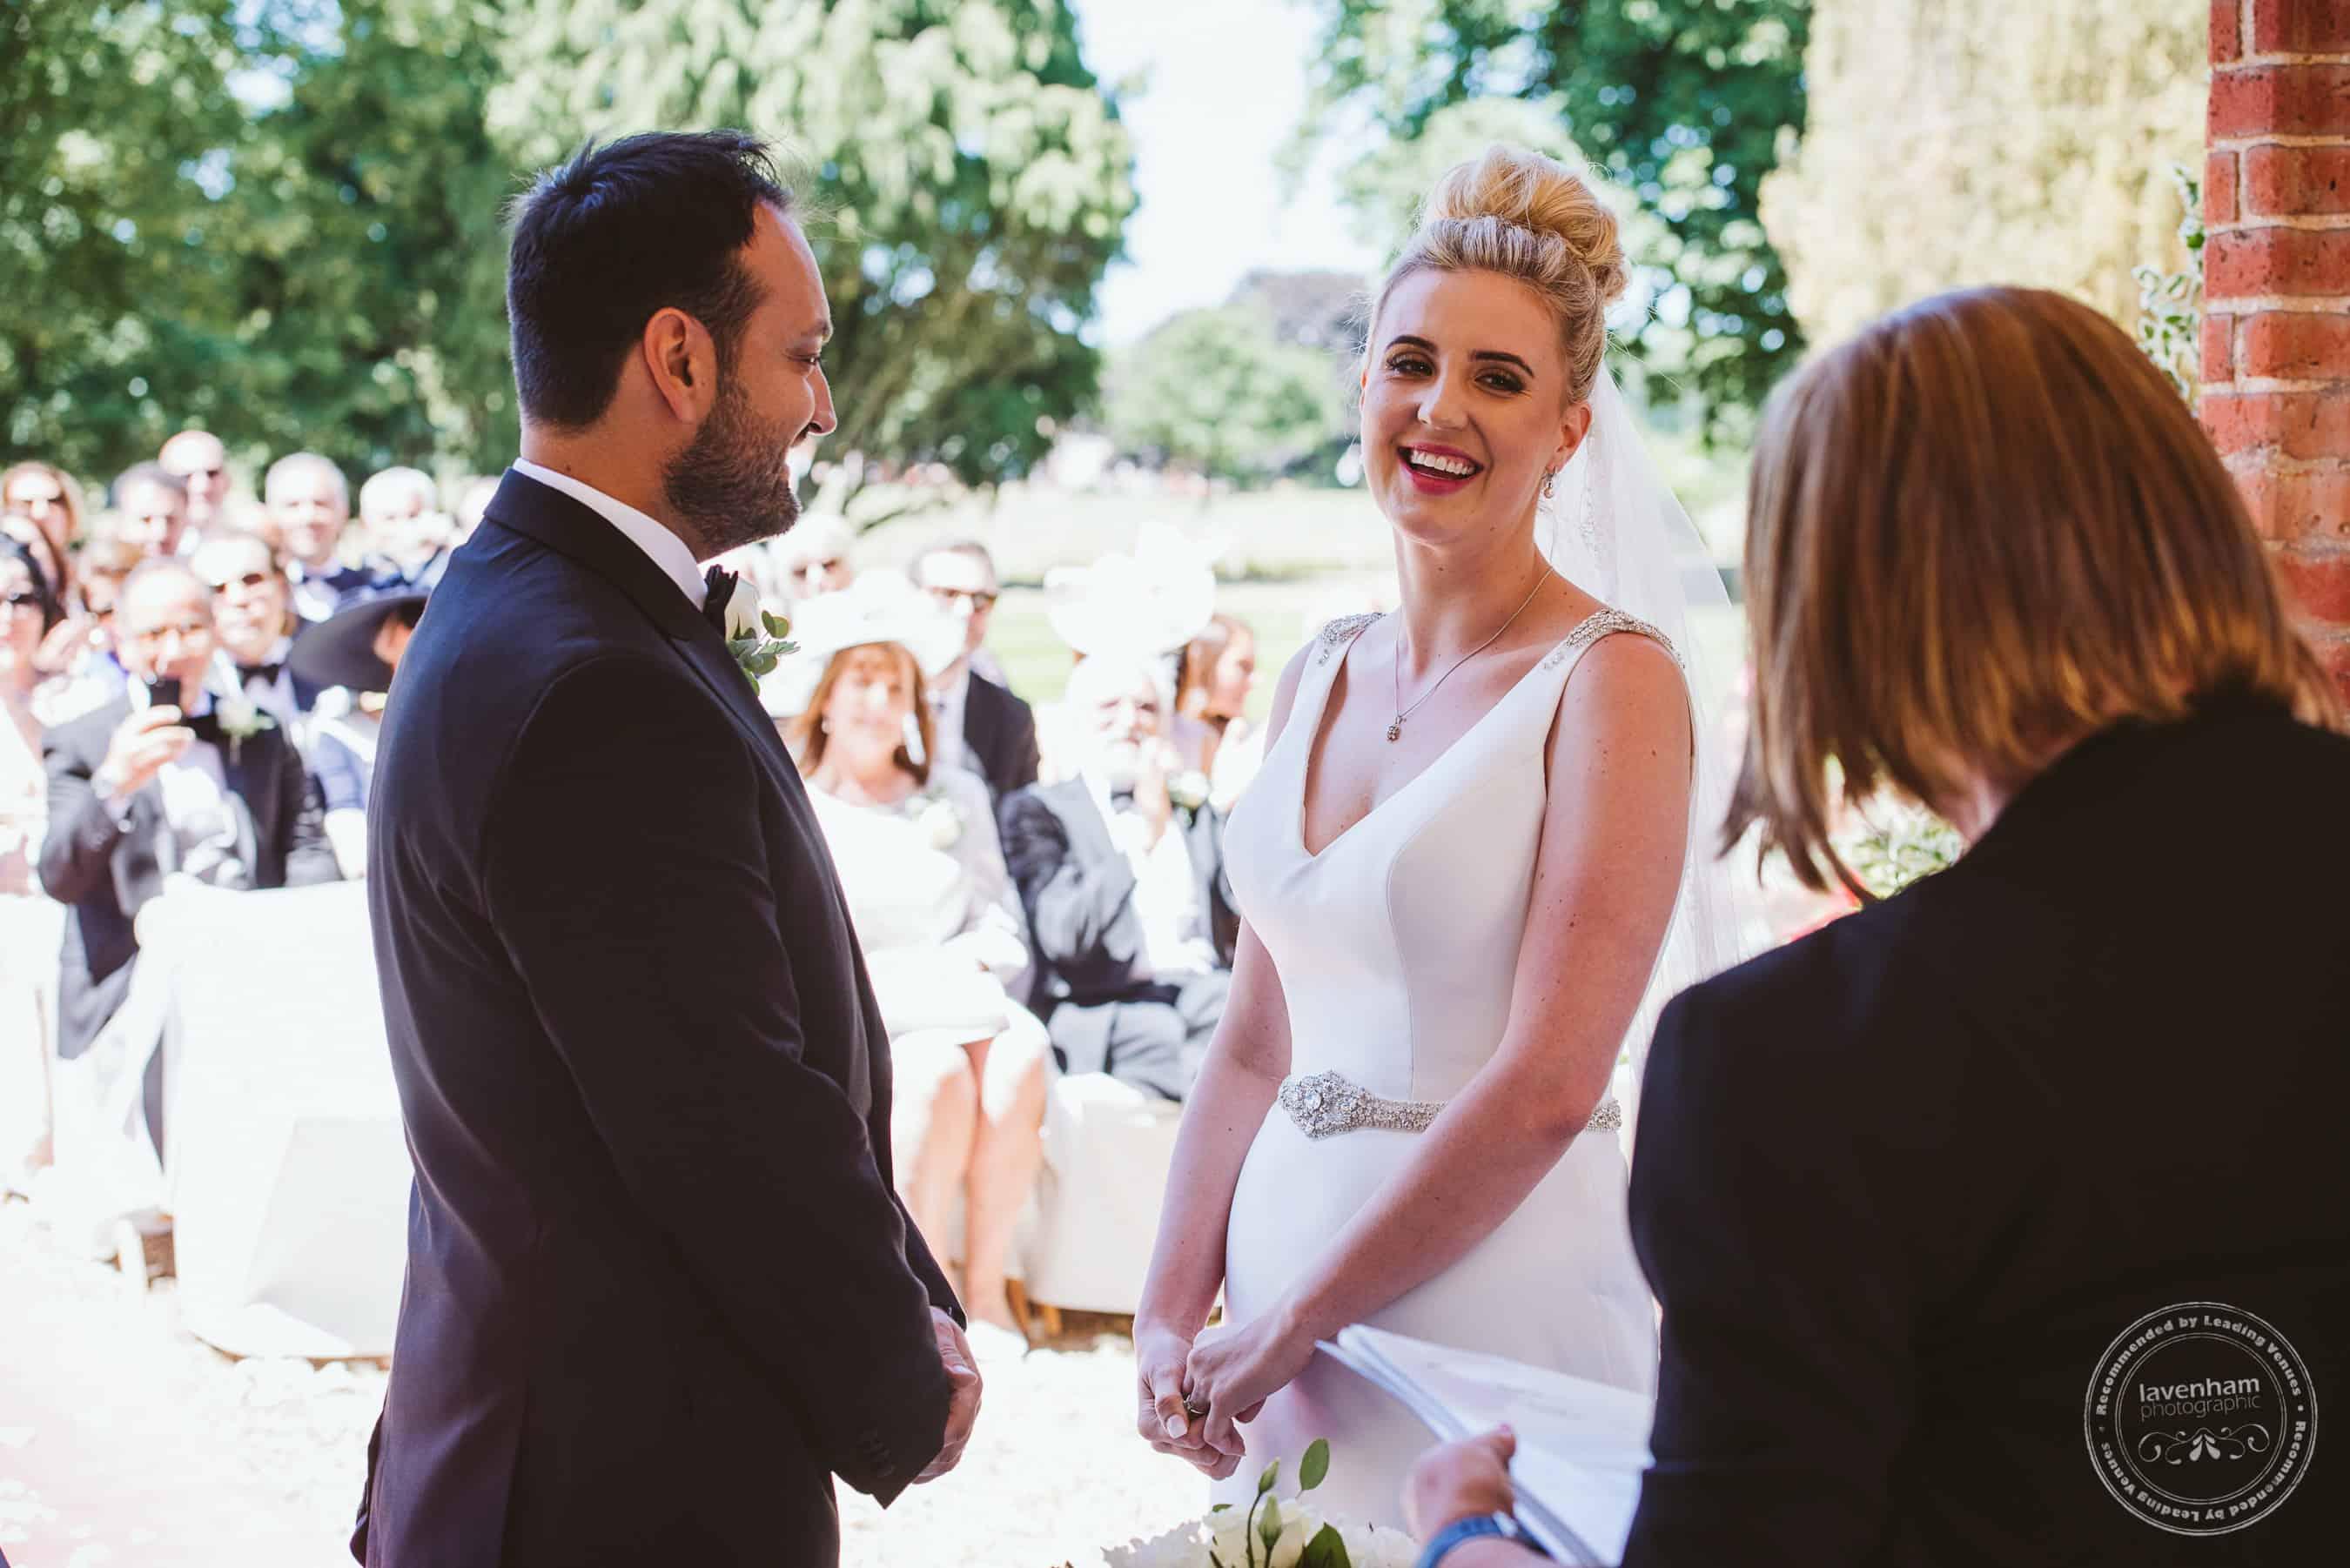 220618 Gosfield Hall Wedding Photography Lavenham Photographic 0081